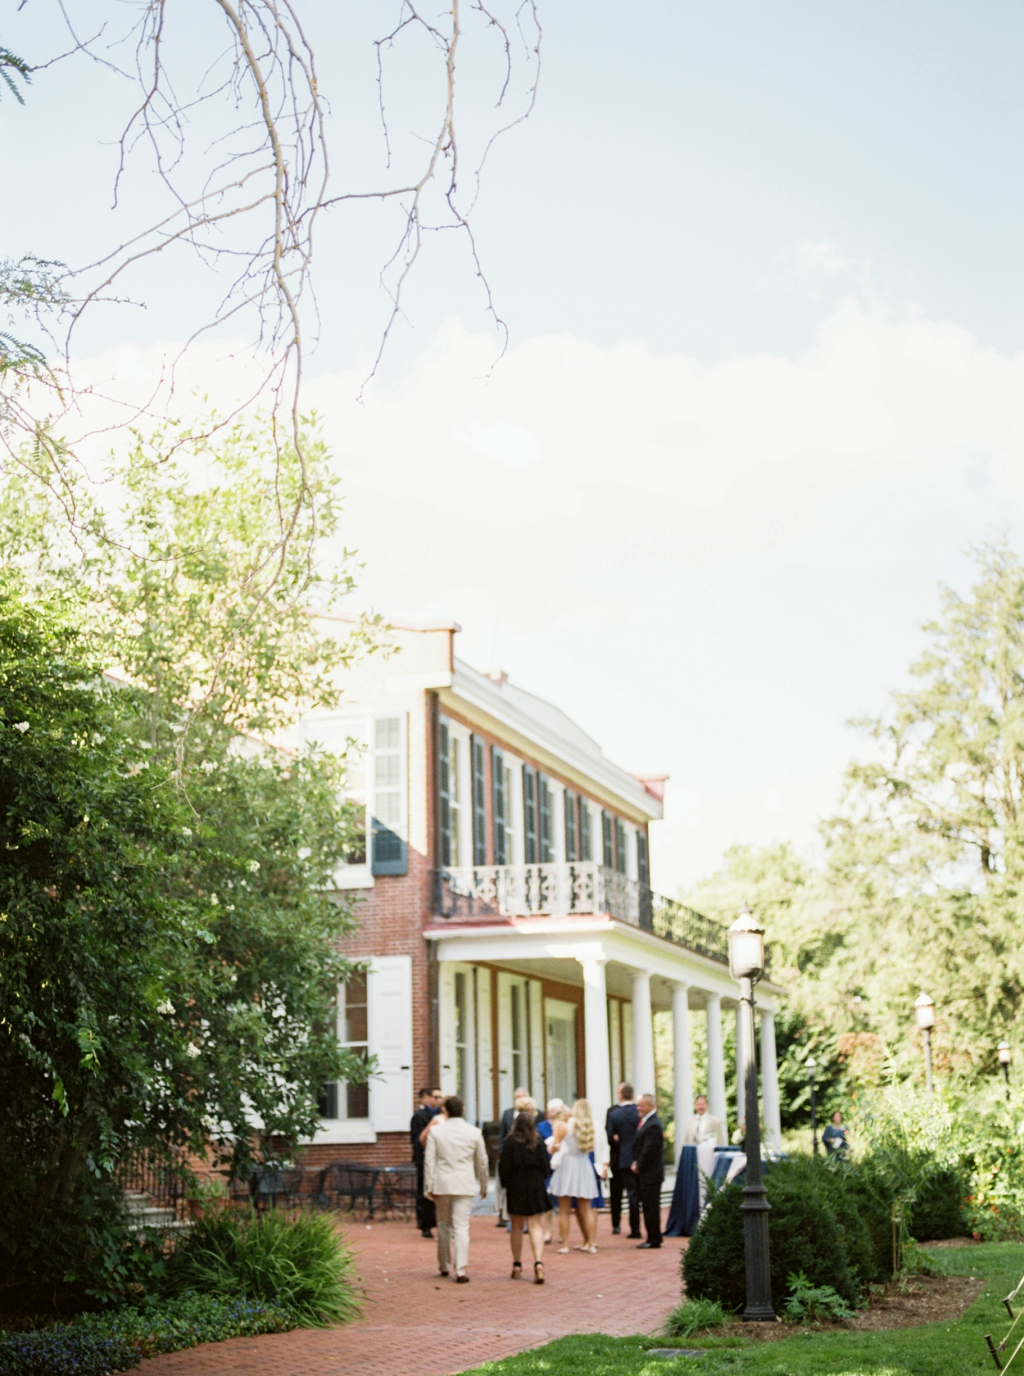 haley-richter-photography-buena-vista-confrence-center-wedding-summer-198